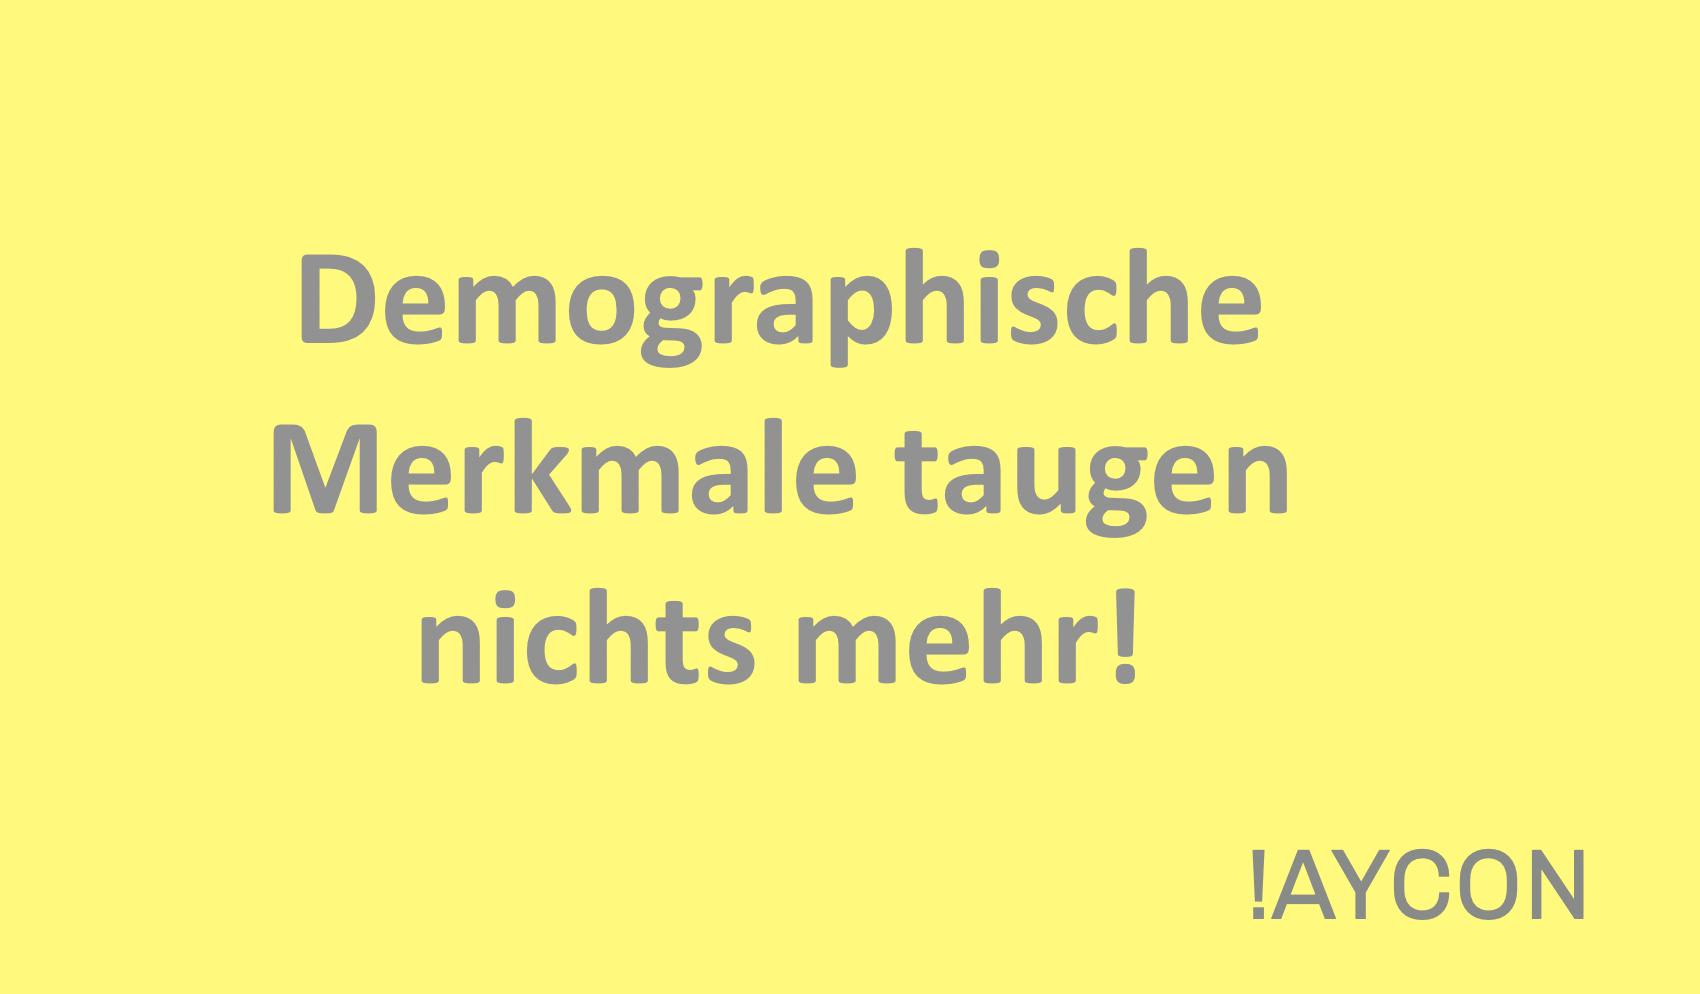 Demographische Merkmale taugen nichts mehr!